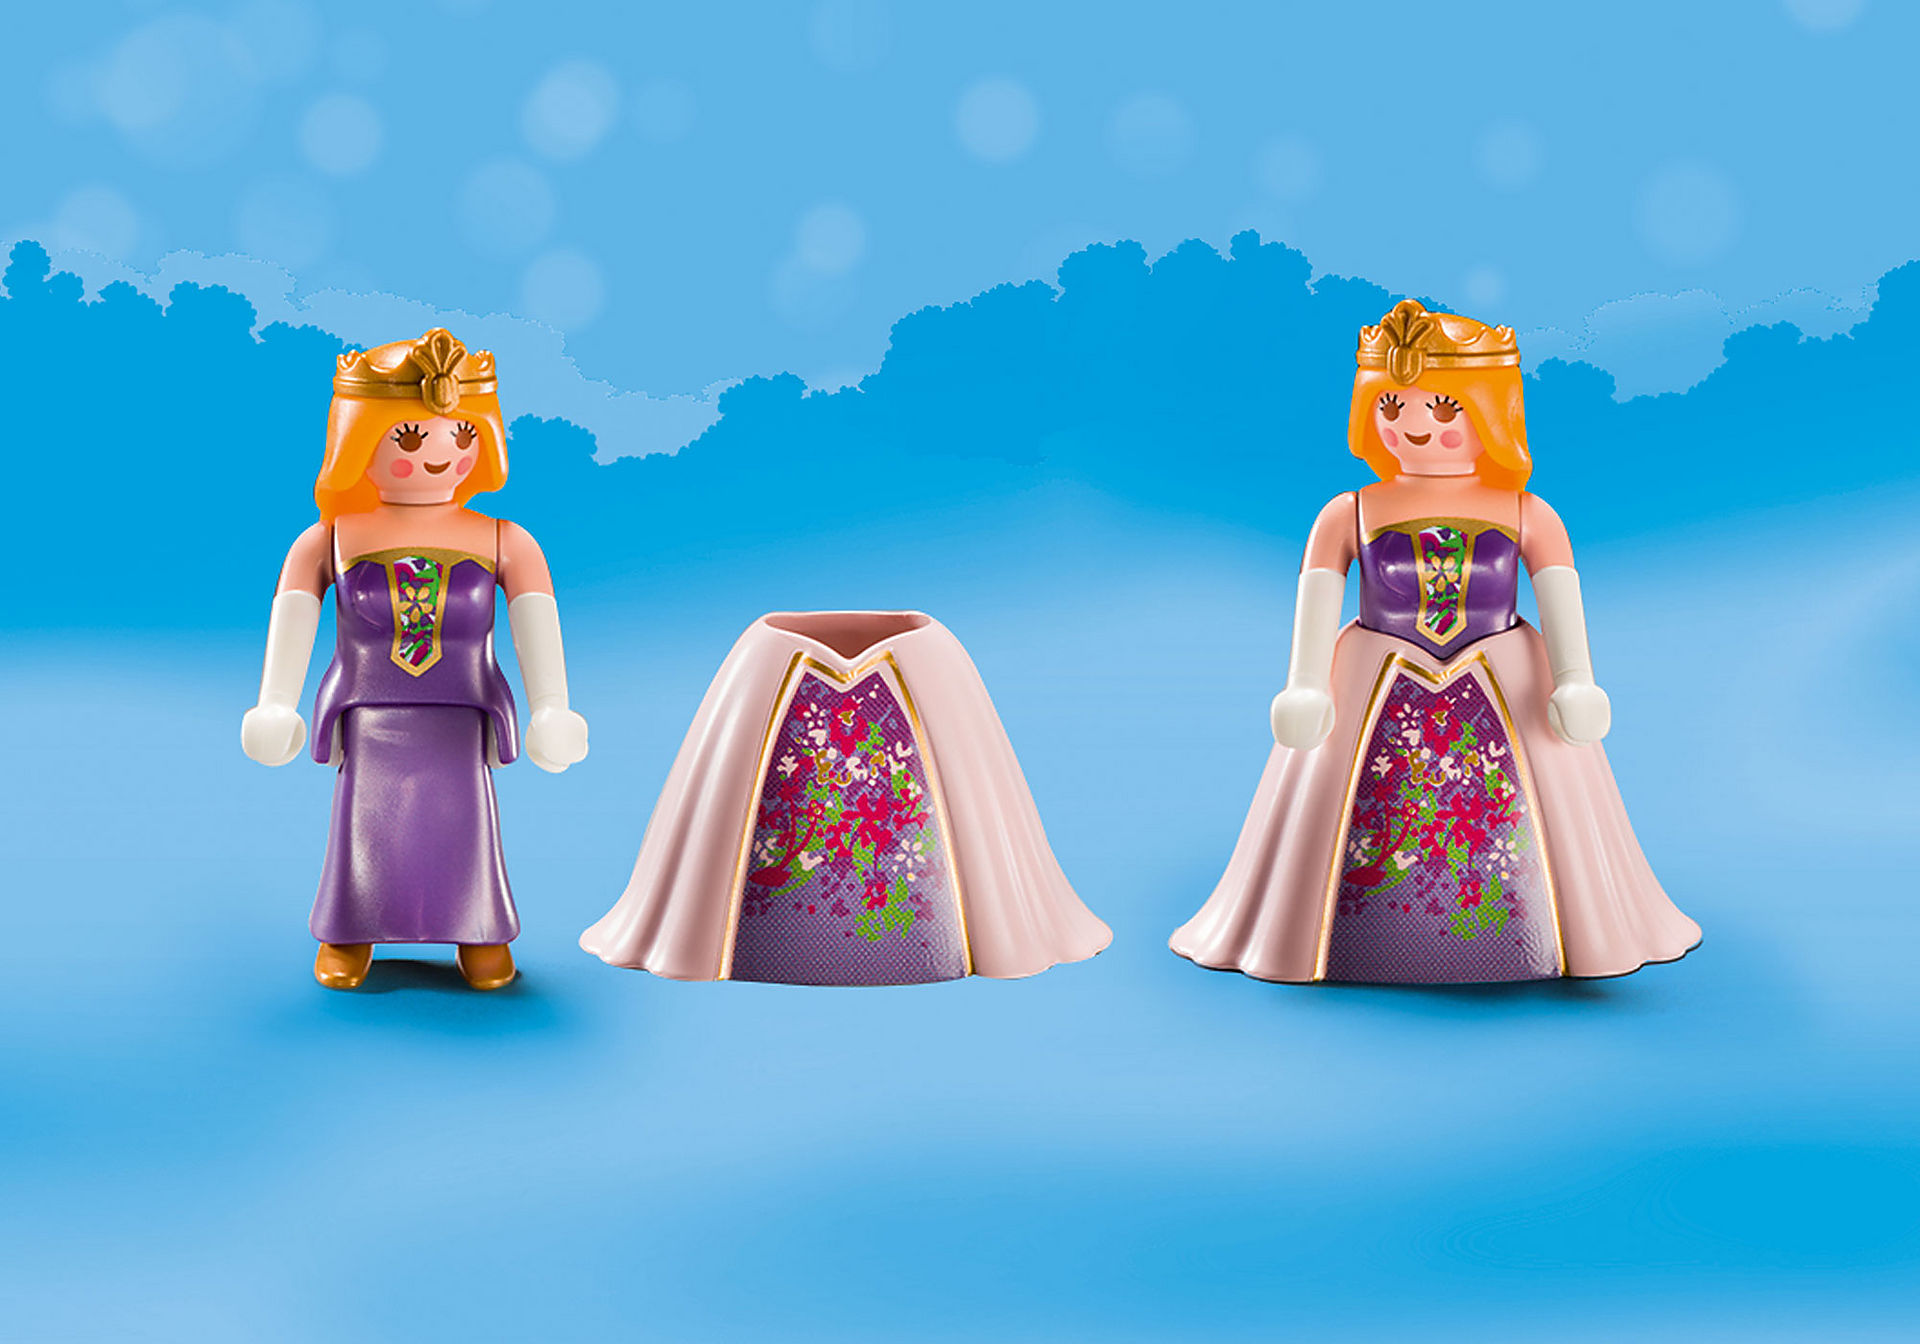 Maletín Grande Princesas Y Unicornio 70107 Playmobil España